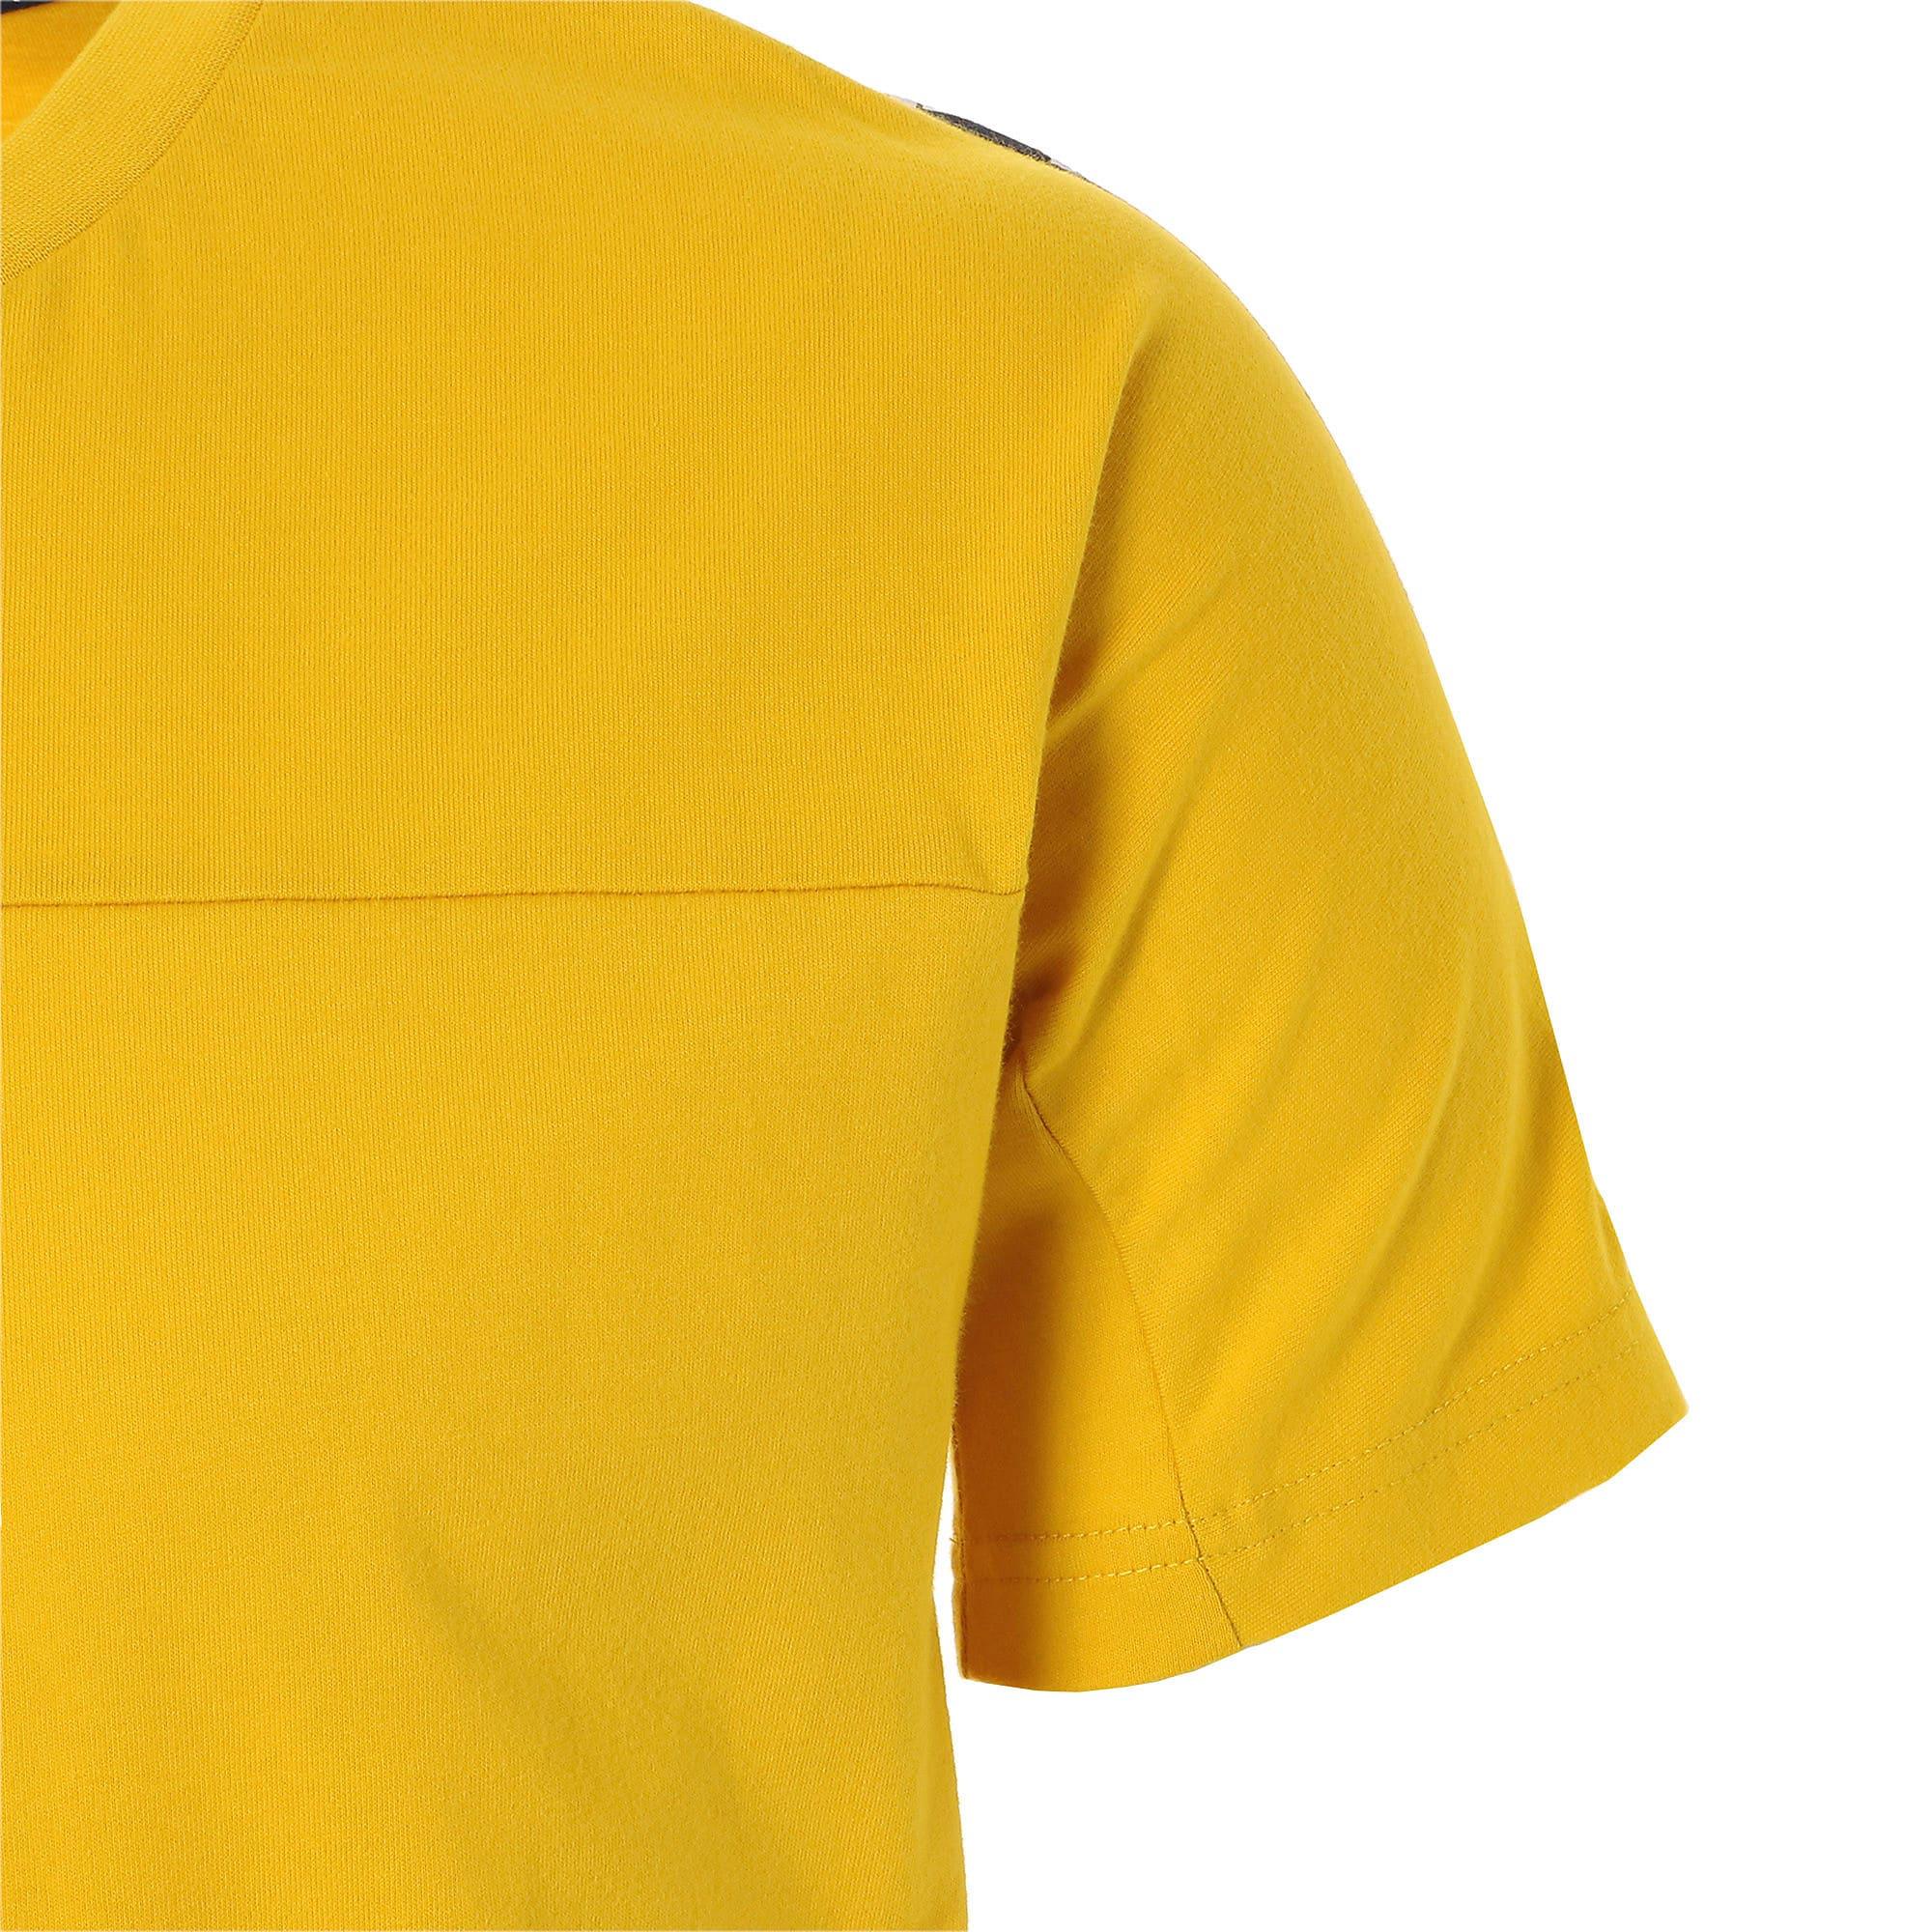 Thumbnail 7 of PUMA XTG SS Tシャツ, Sulphur, medium-JPN